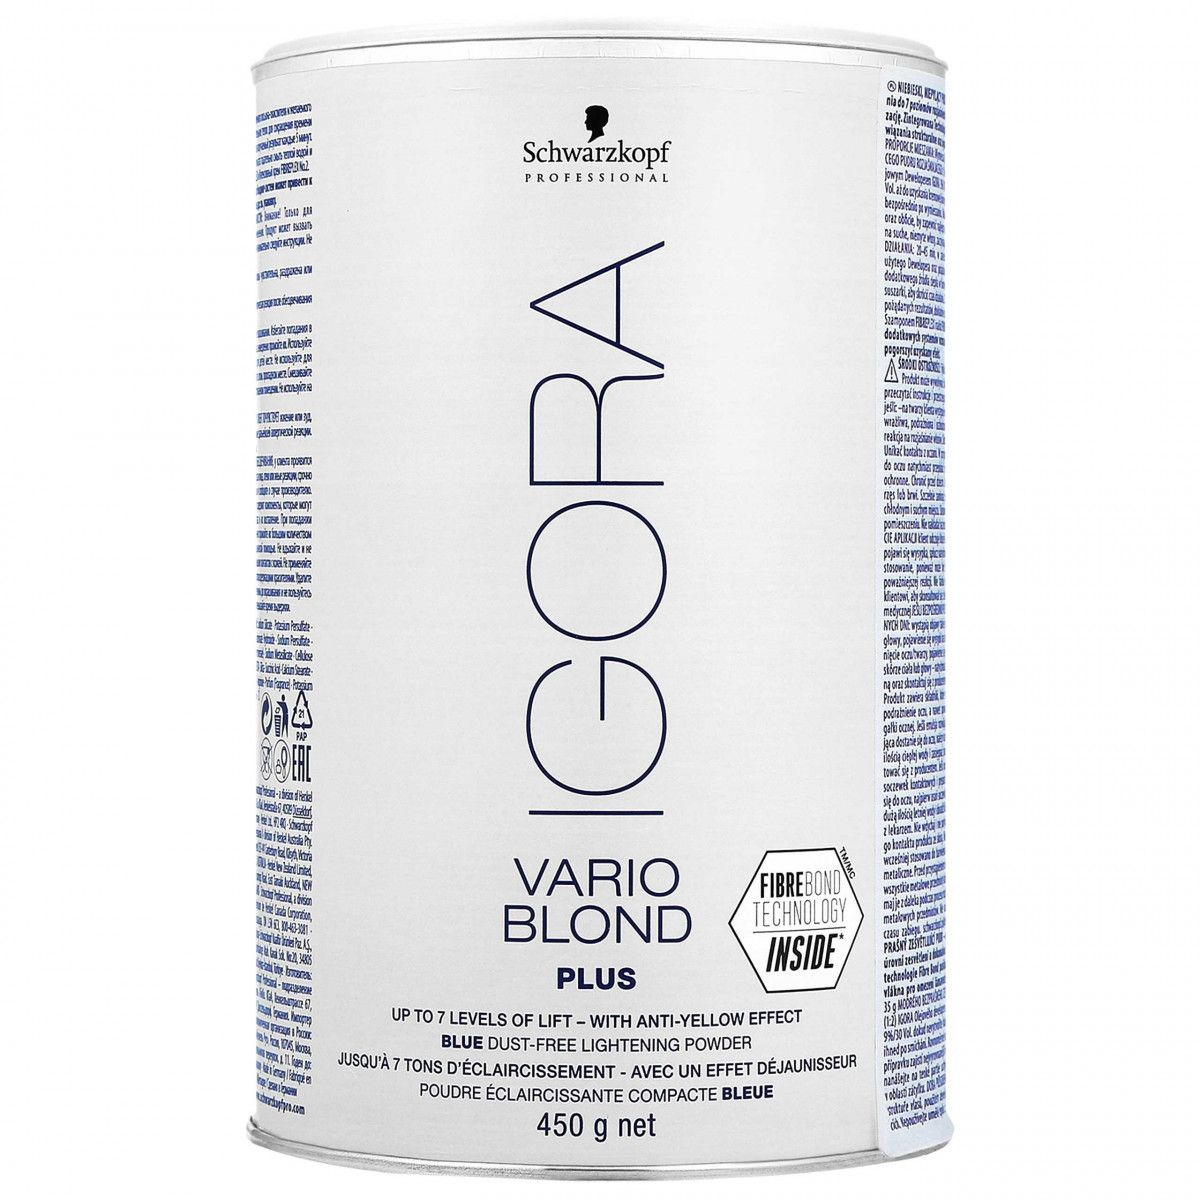 Schwarzkopf Igora Vario Blond Plus puder rozjaśniający 450g